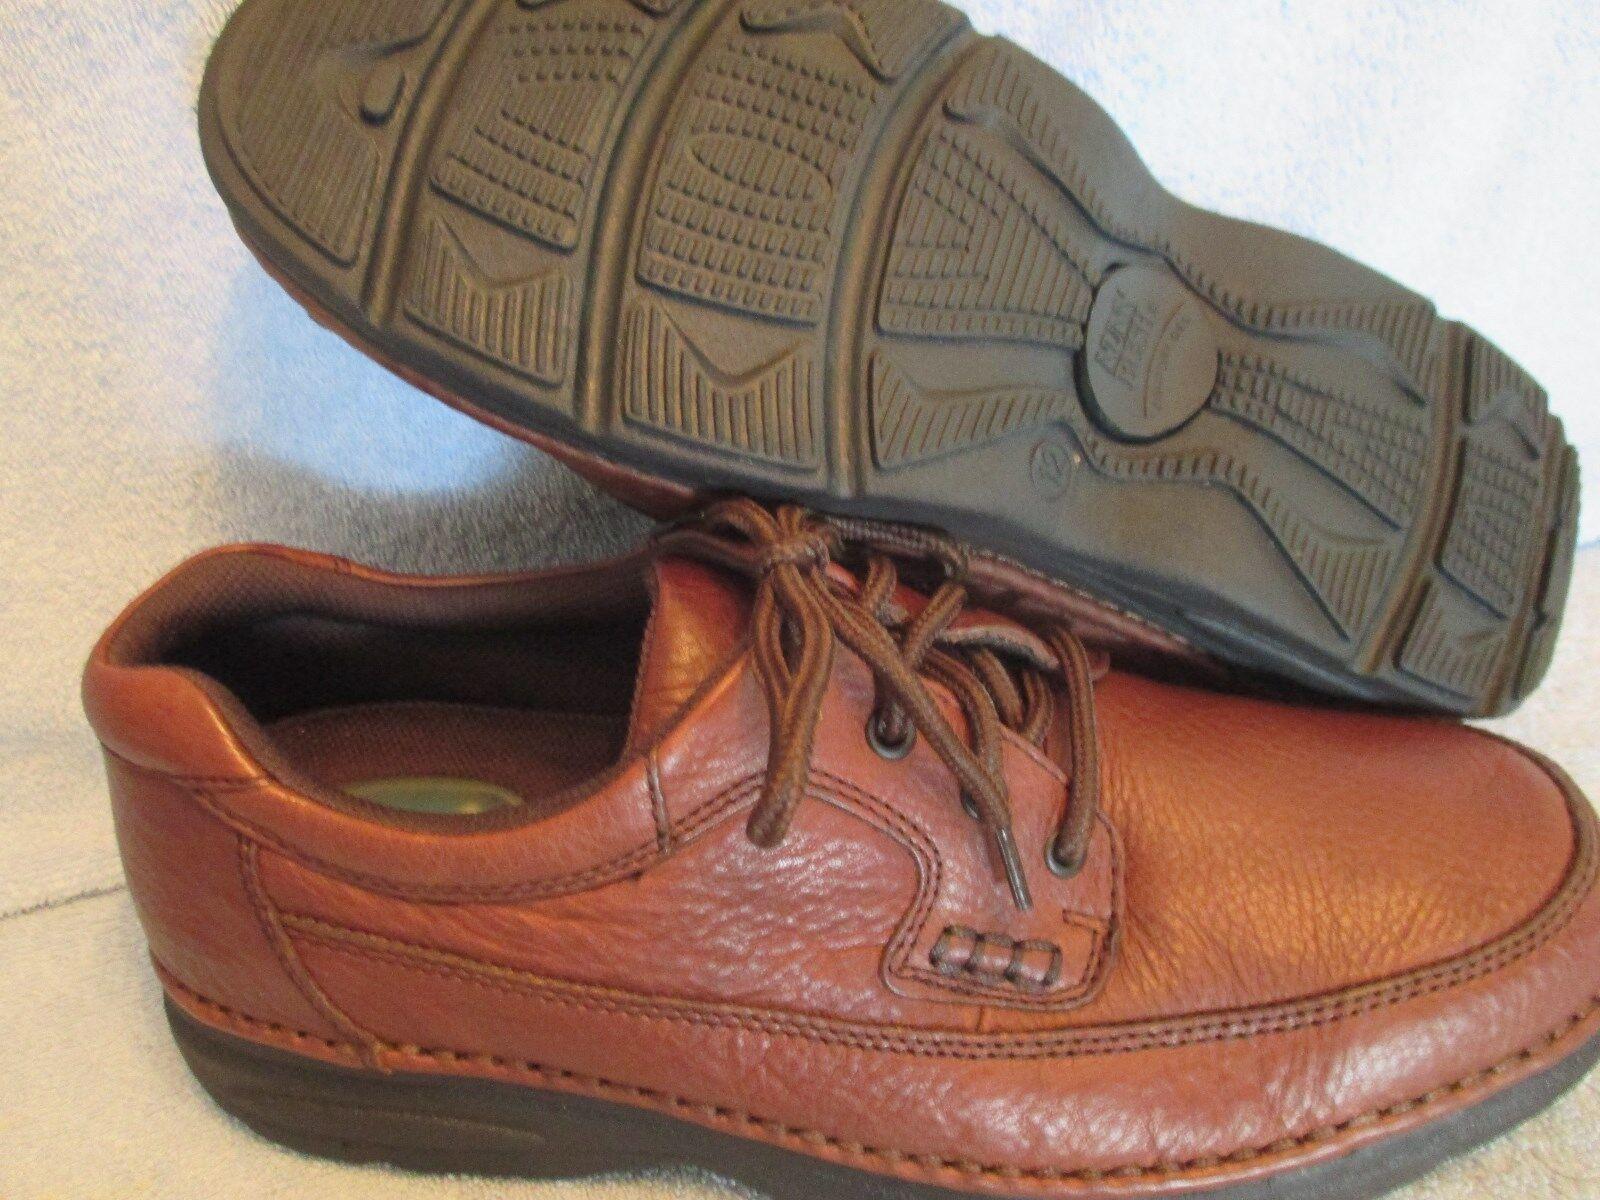 Uomo Schuhes NUNN BUSH BROWN Größe 12 M BROWN BUSH LEATHER OXFORDS NWOT 82daab